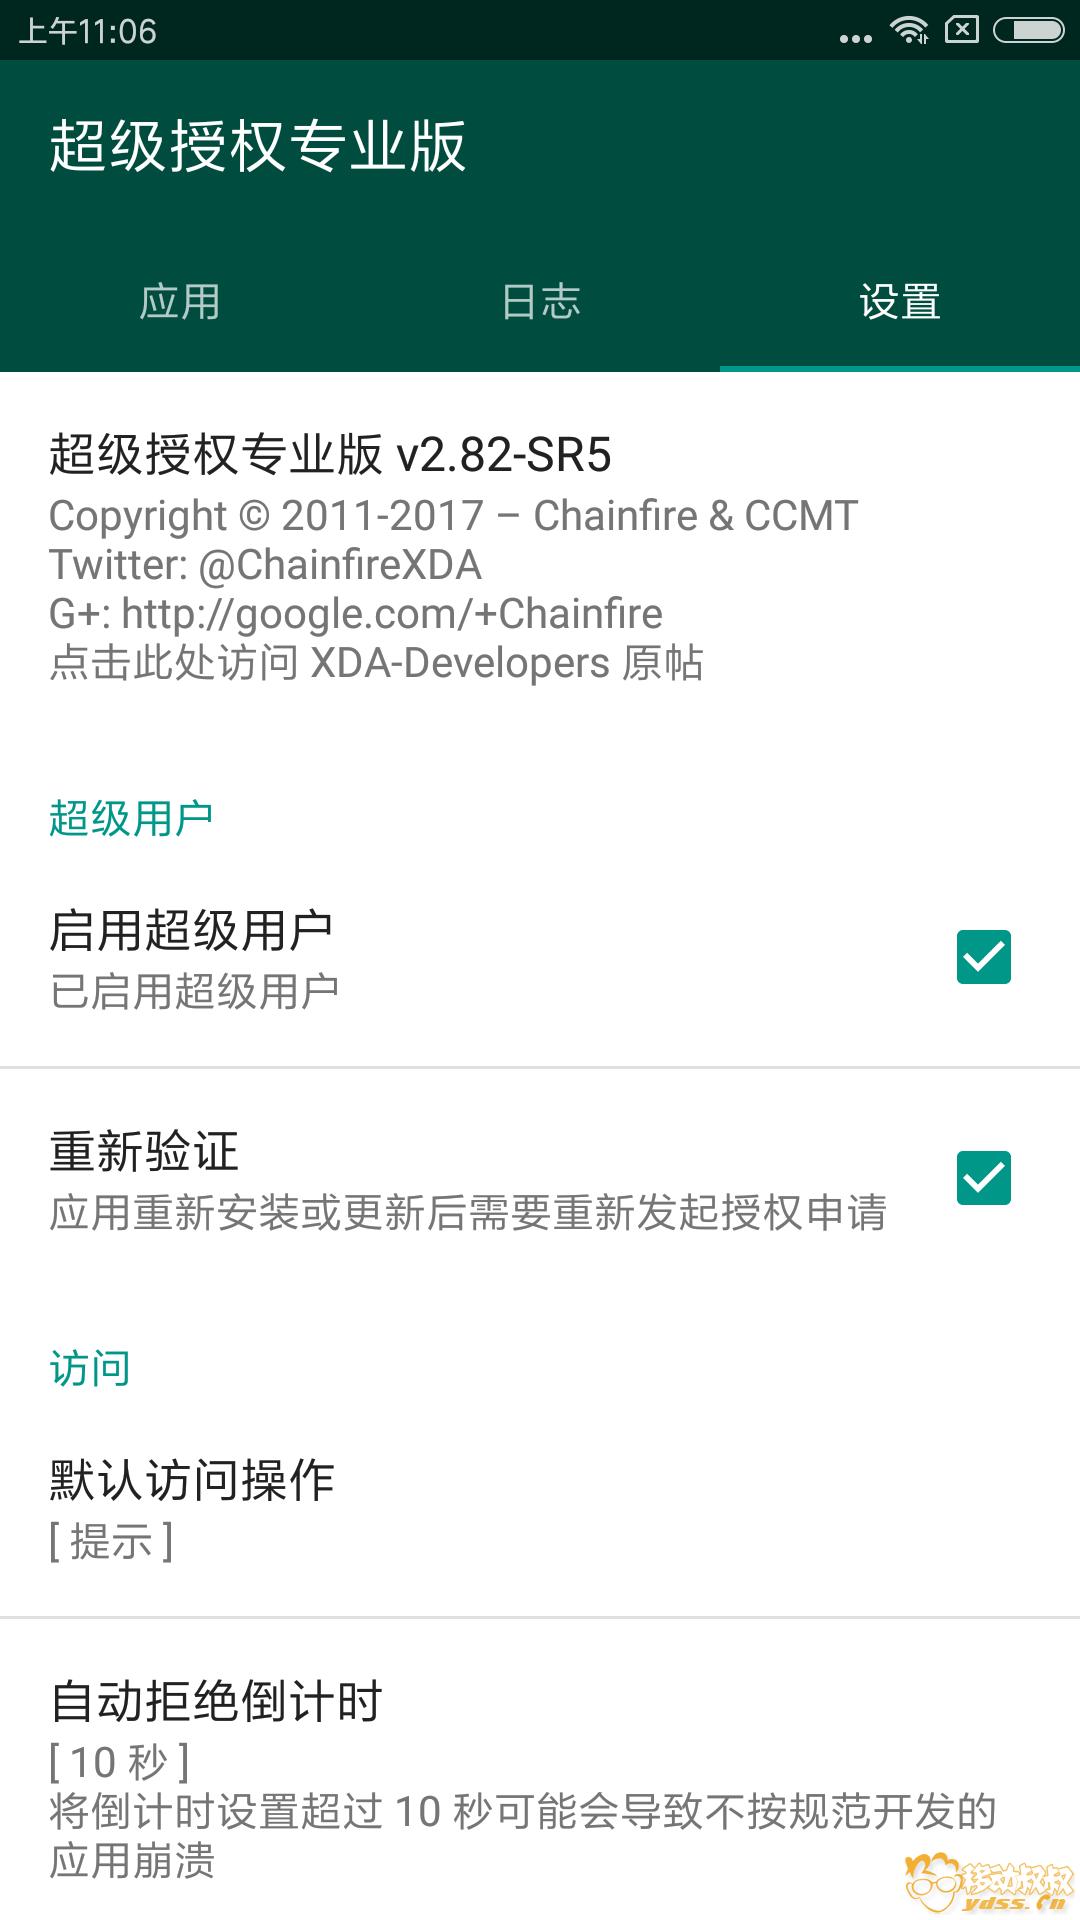 Screenshot_2018-06-16-11-06-05-967_eu.chainfire.supersu.png